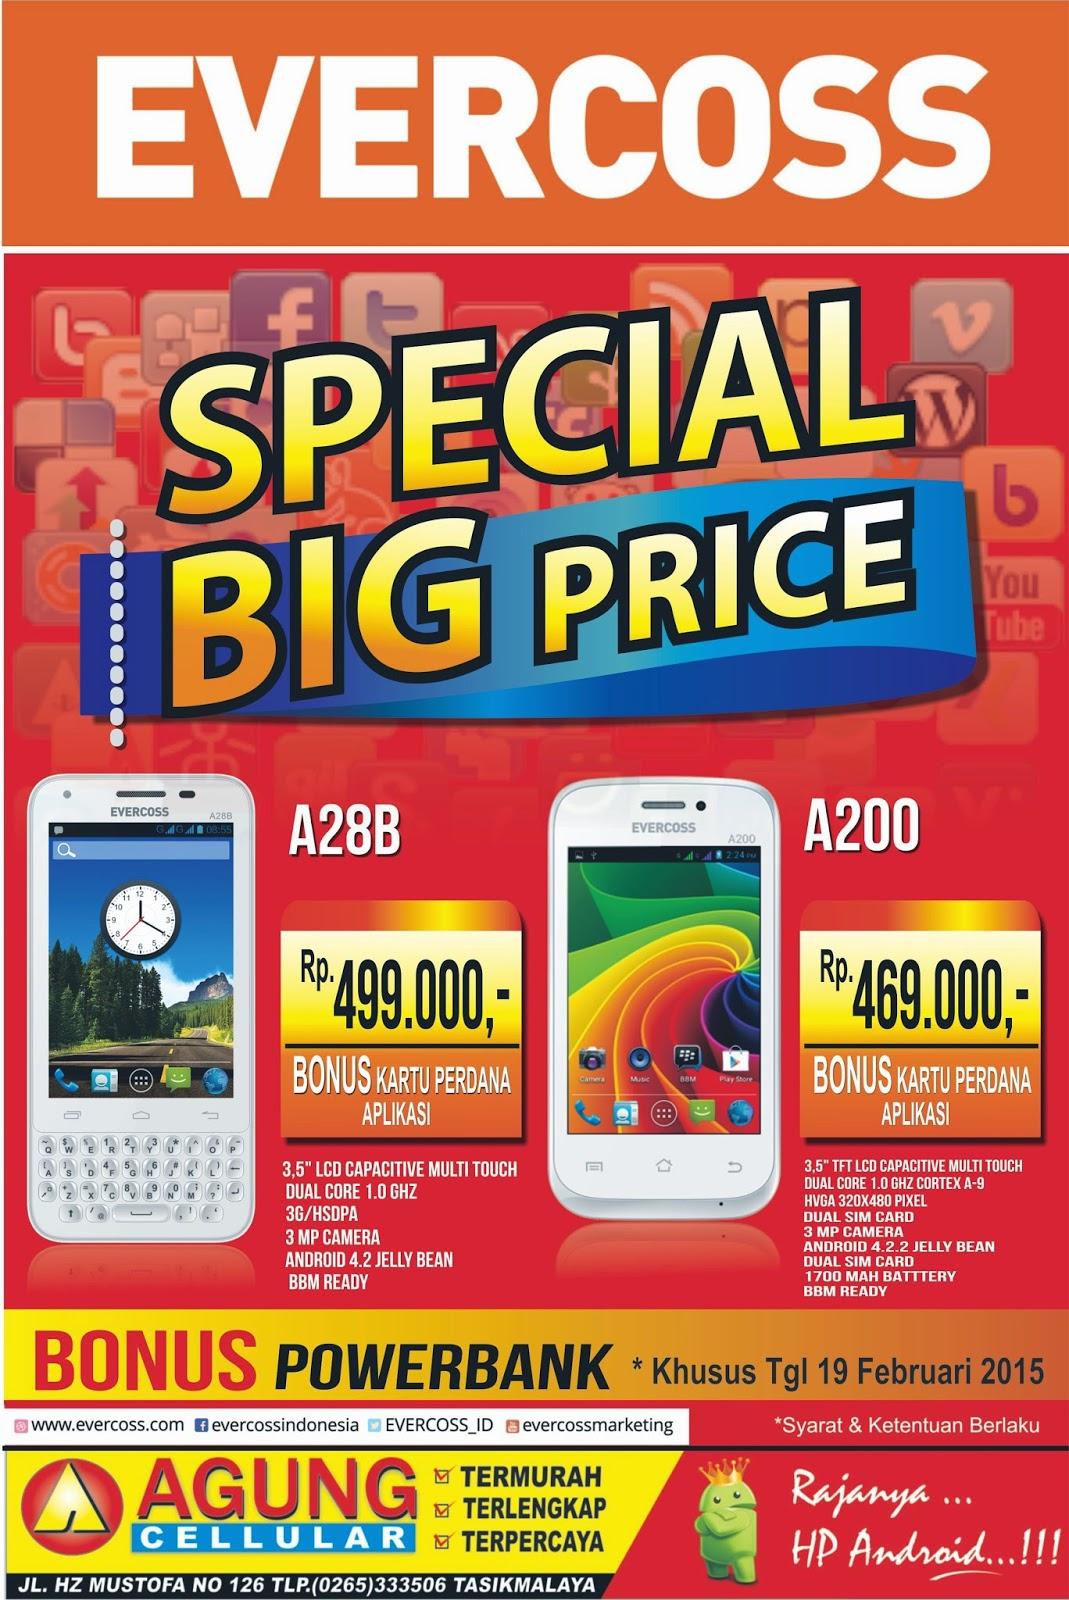 Agung Celullar Termurahterlengkap Dan Terpercaya Februari 2015 Evercoss A28b Big Price Dari Beli Sekarang Ke Agungcell Android Super Murah